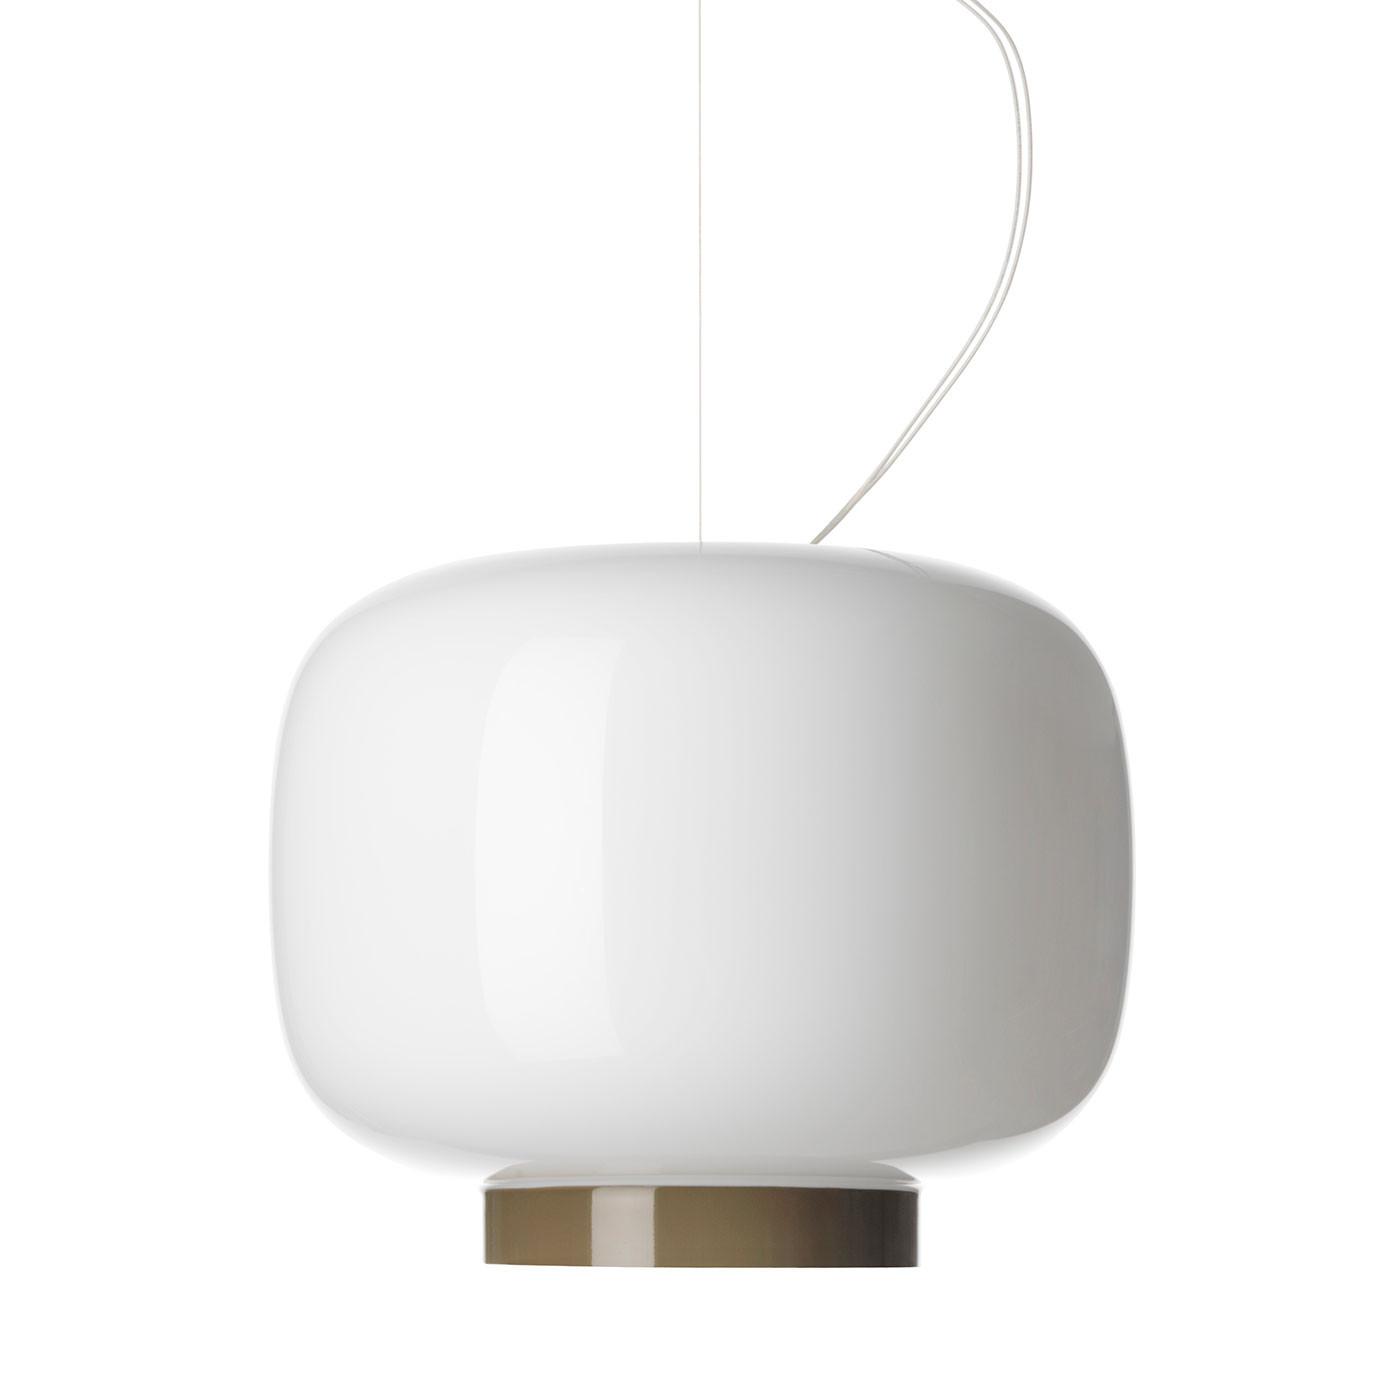 Foscarini Chouchin 3 Reverse LED